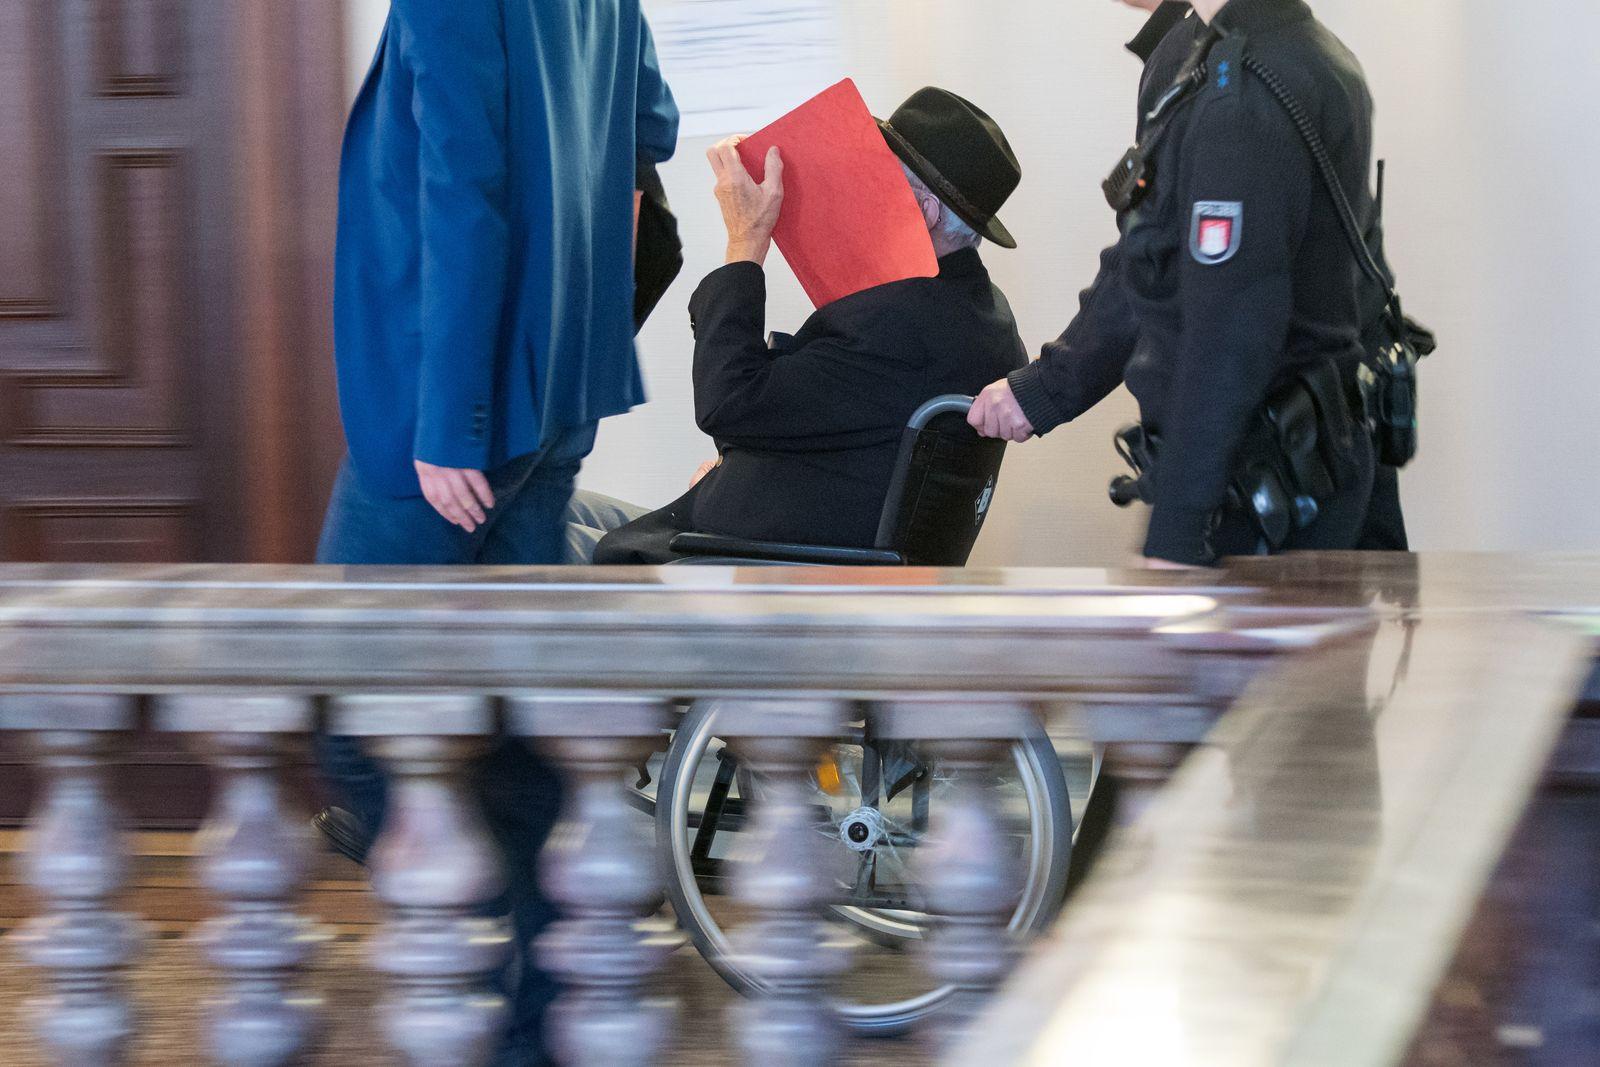 Fortsetzung Prozess gegen ehemaligen SS-Wachmann